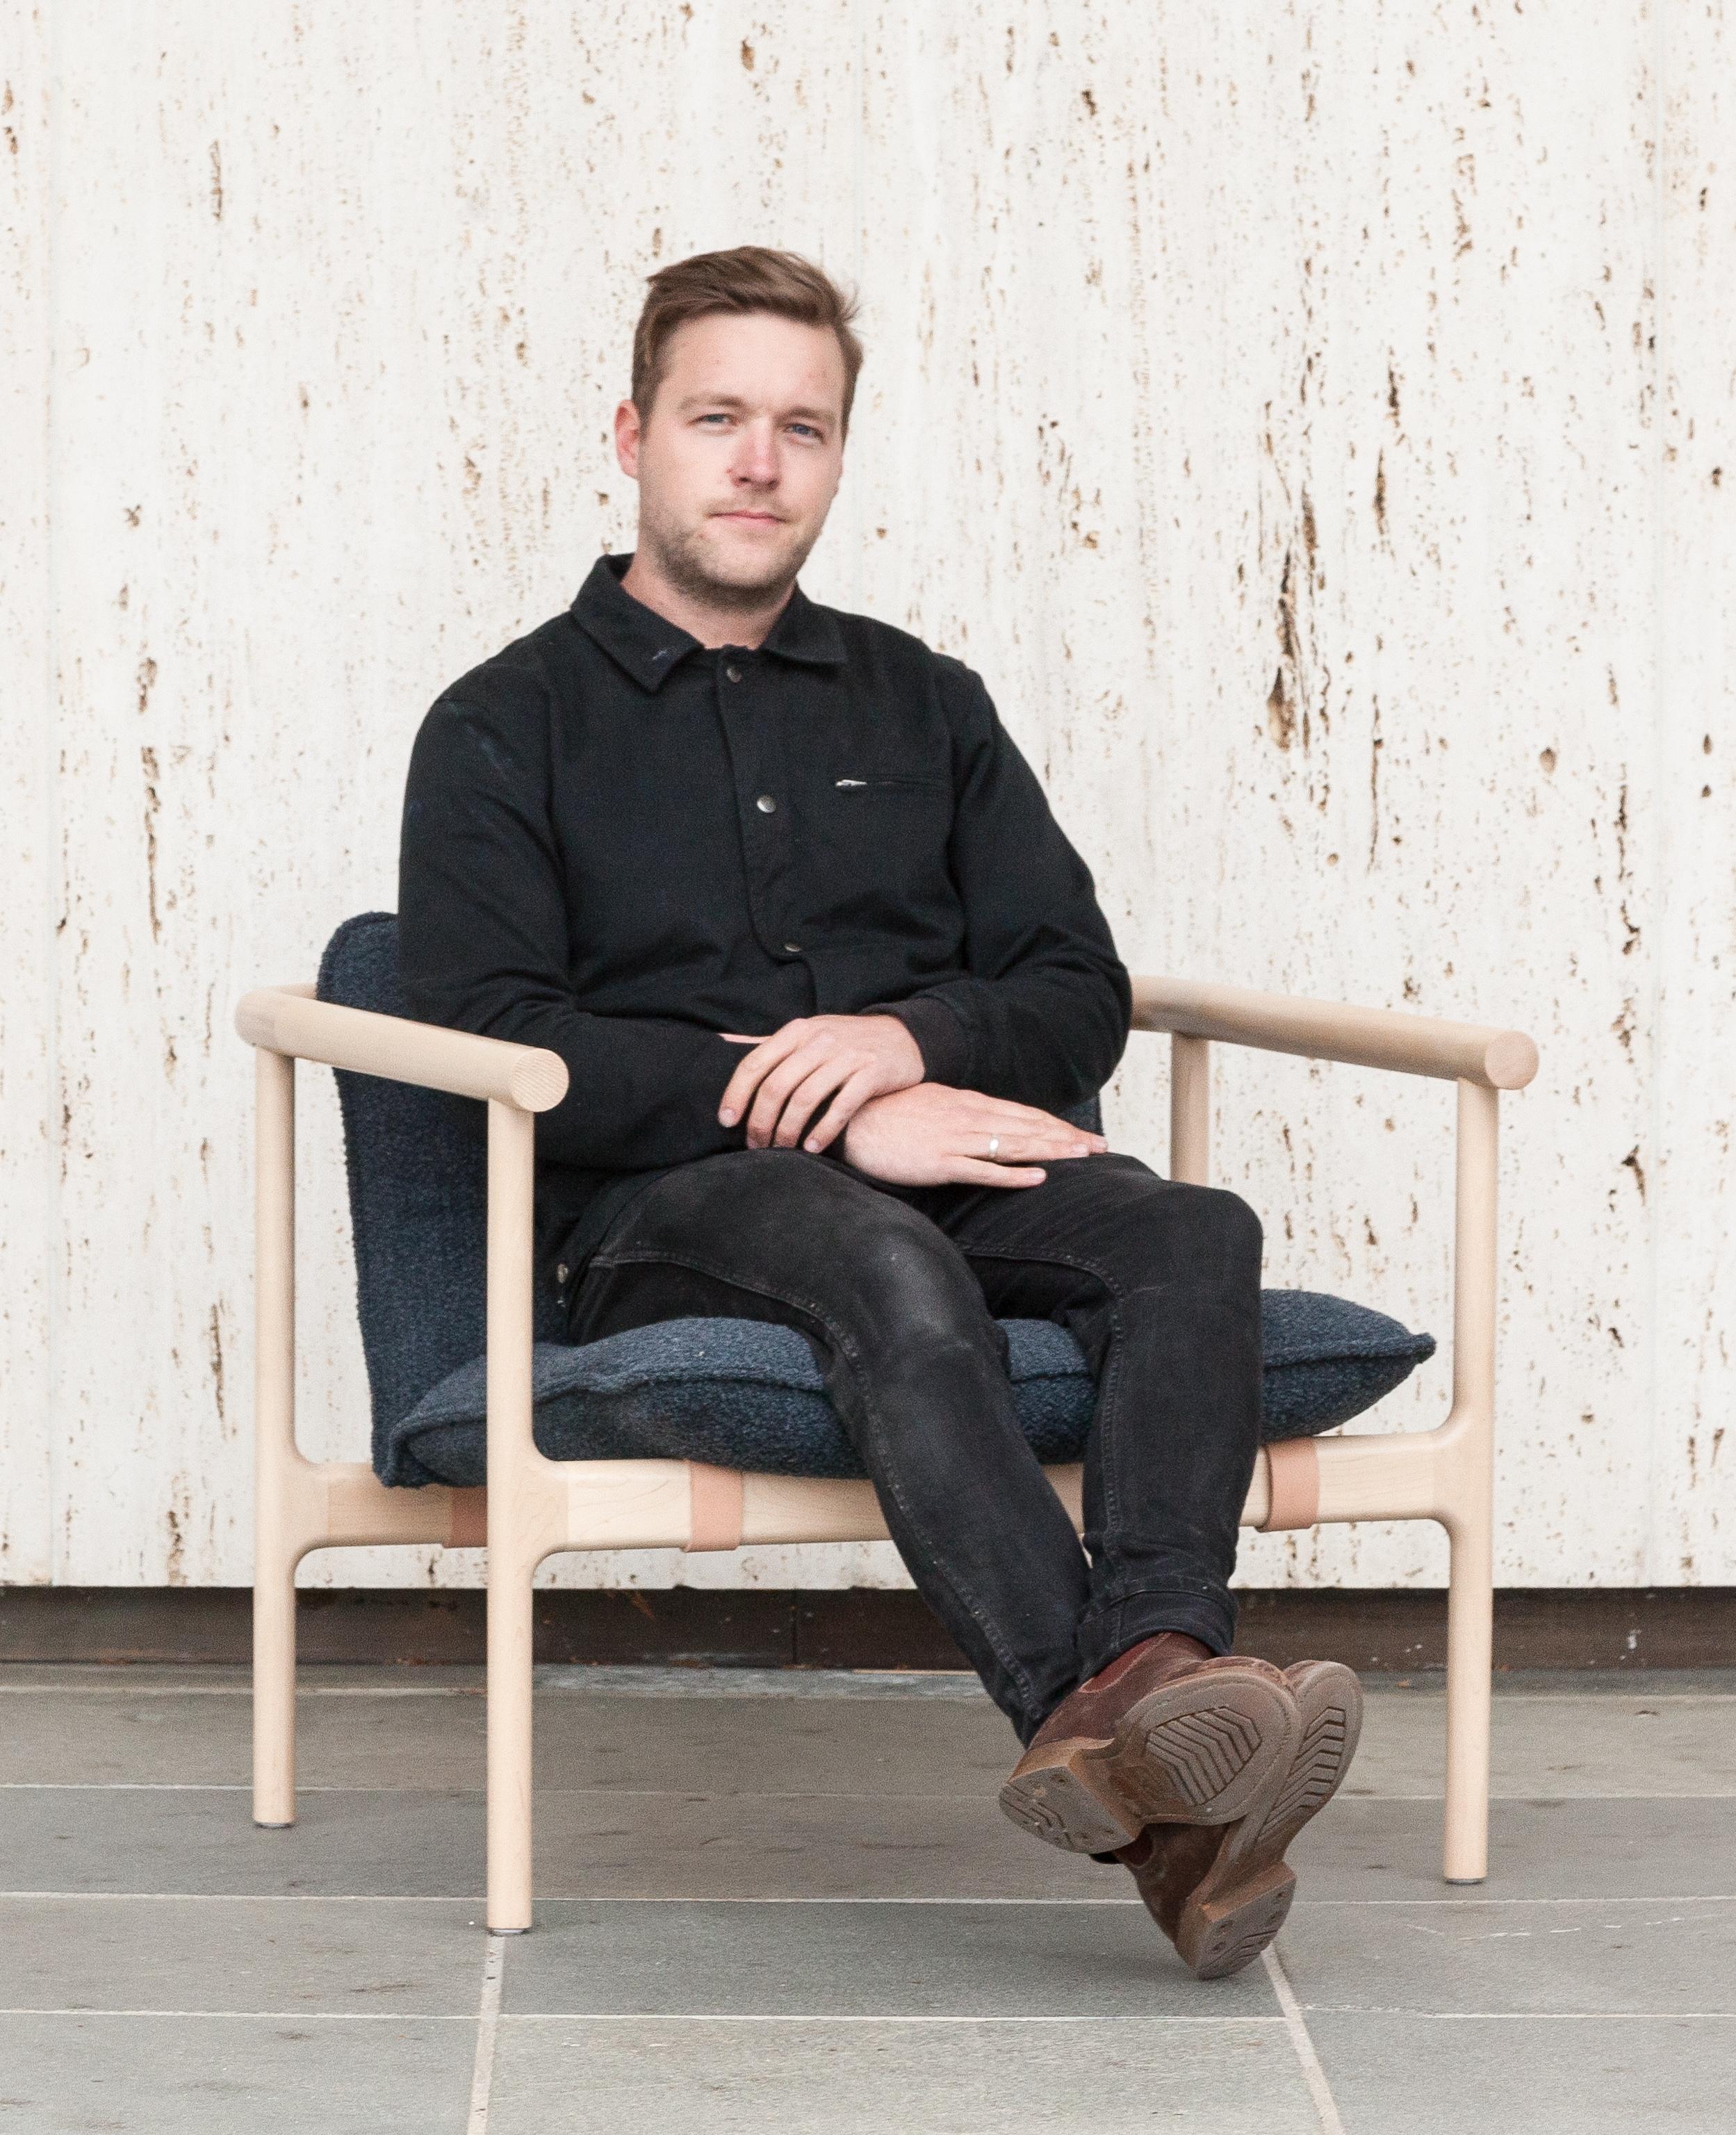 Tom Skeehan Furniture Maker | LFW MAGAZINE